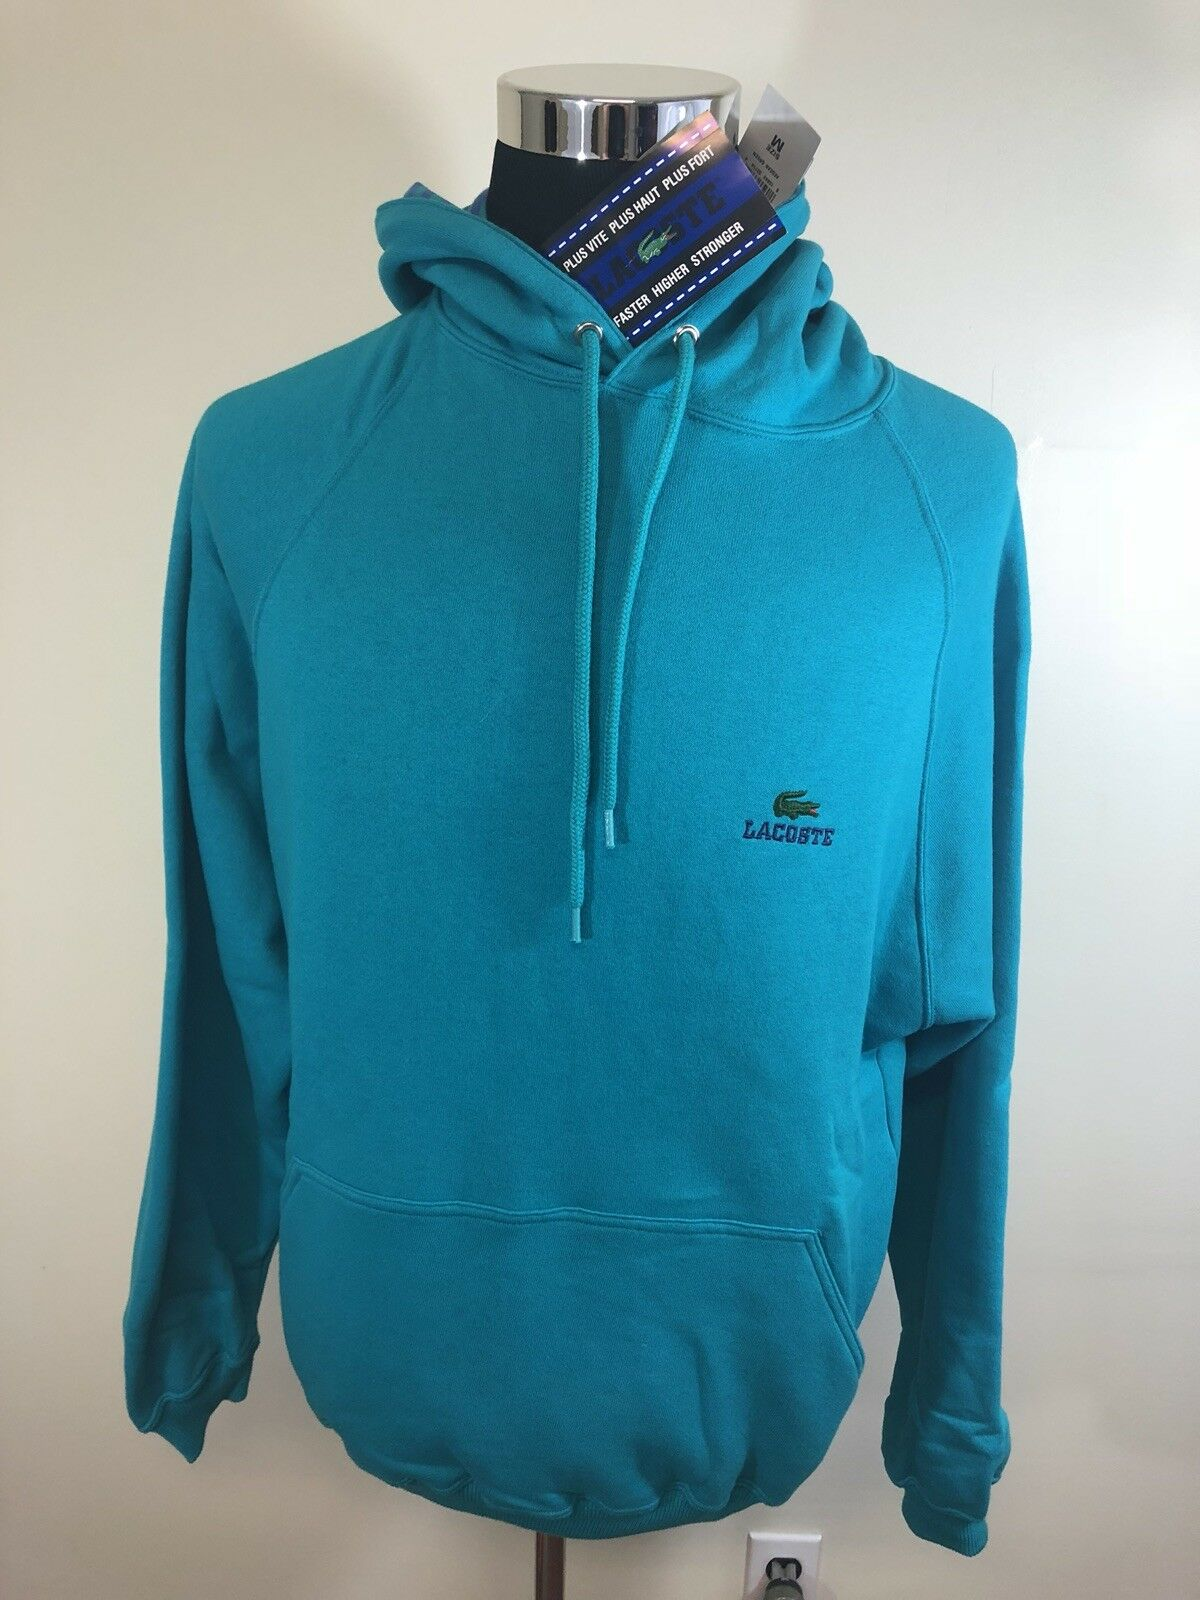 NWT Vintage 1990's Izod Lacoste Hoodie Sweatshirt - Size Medium- New VTG RARE